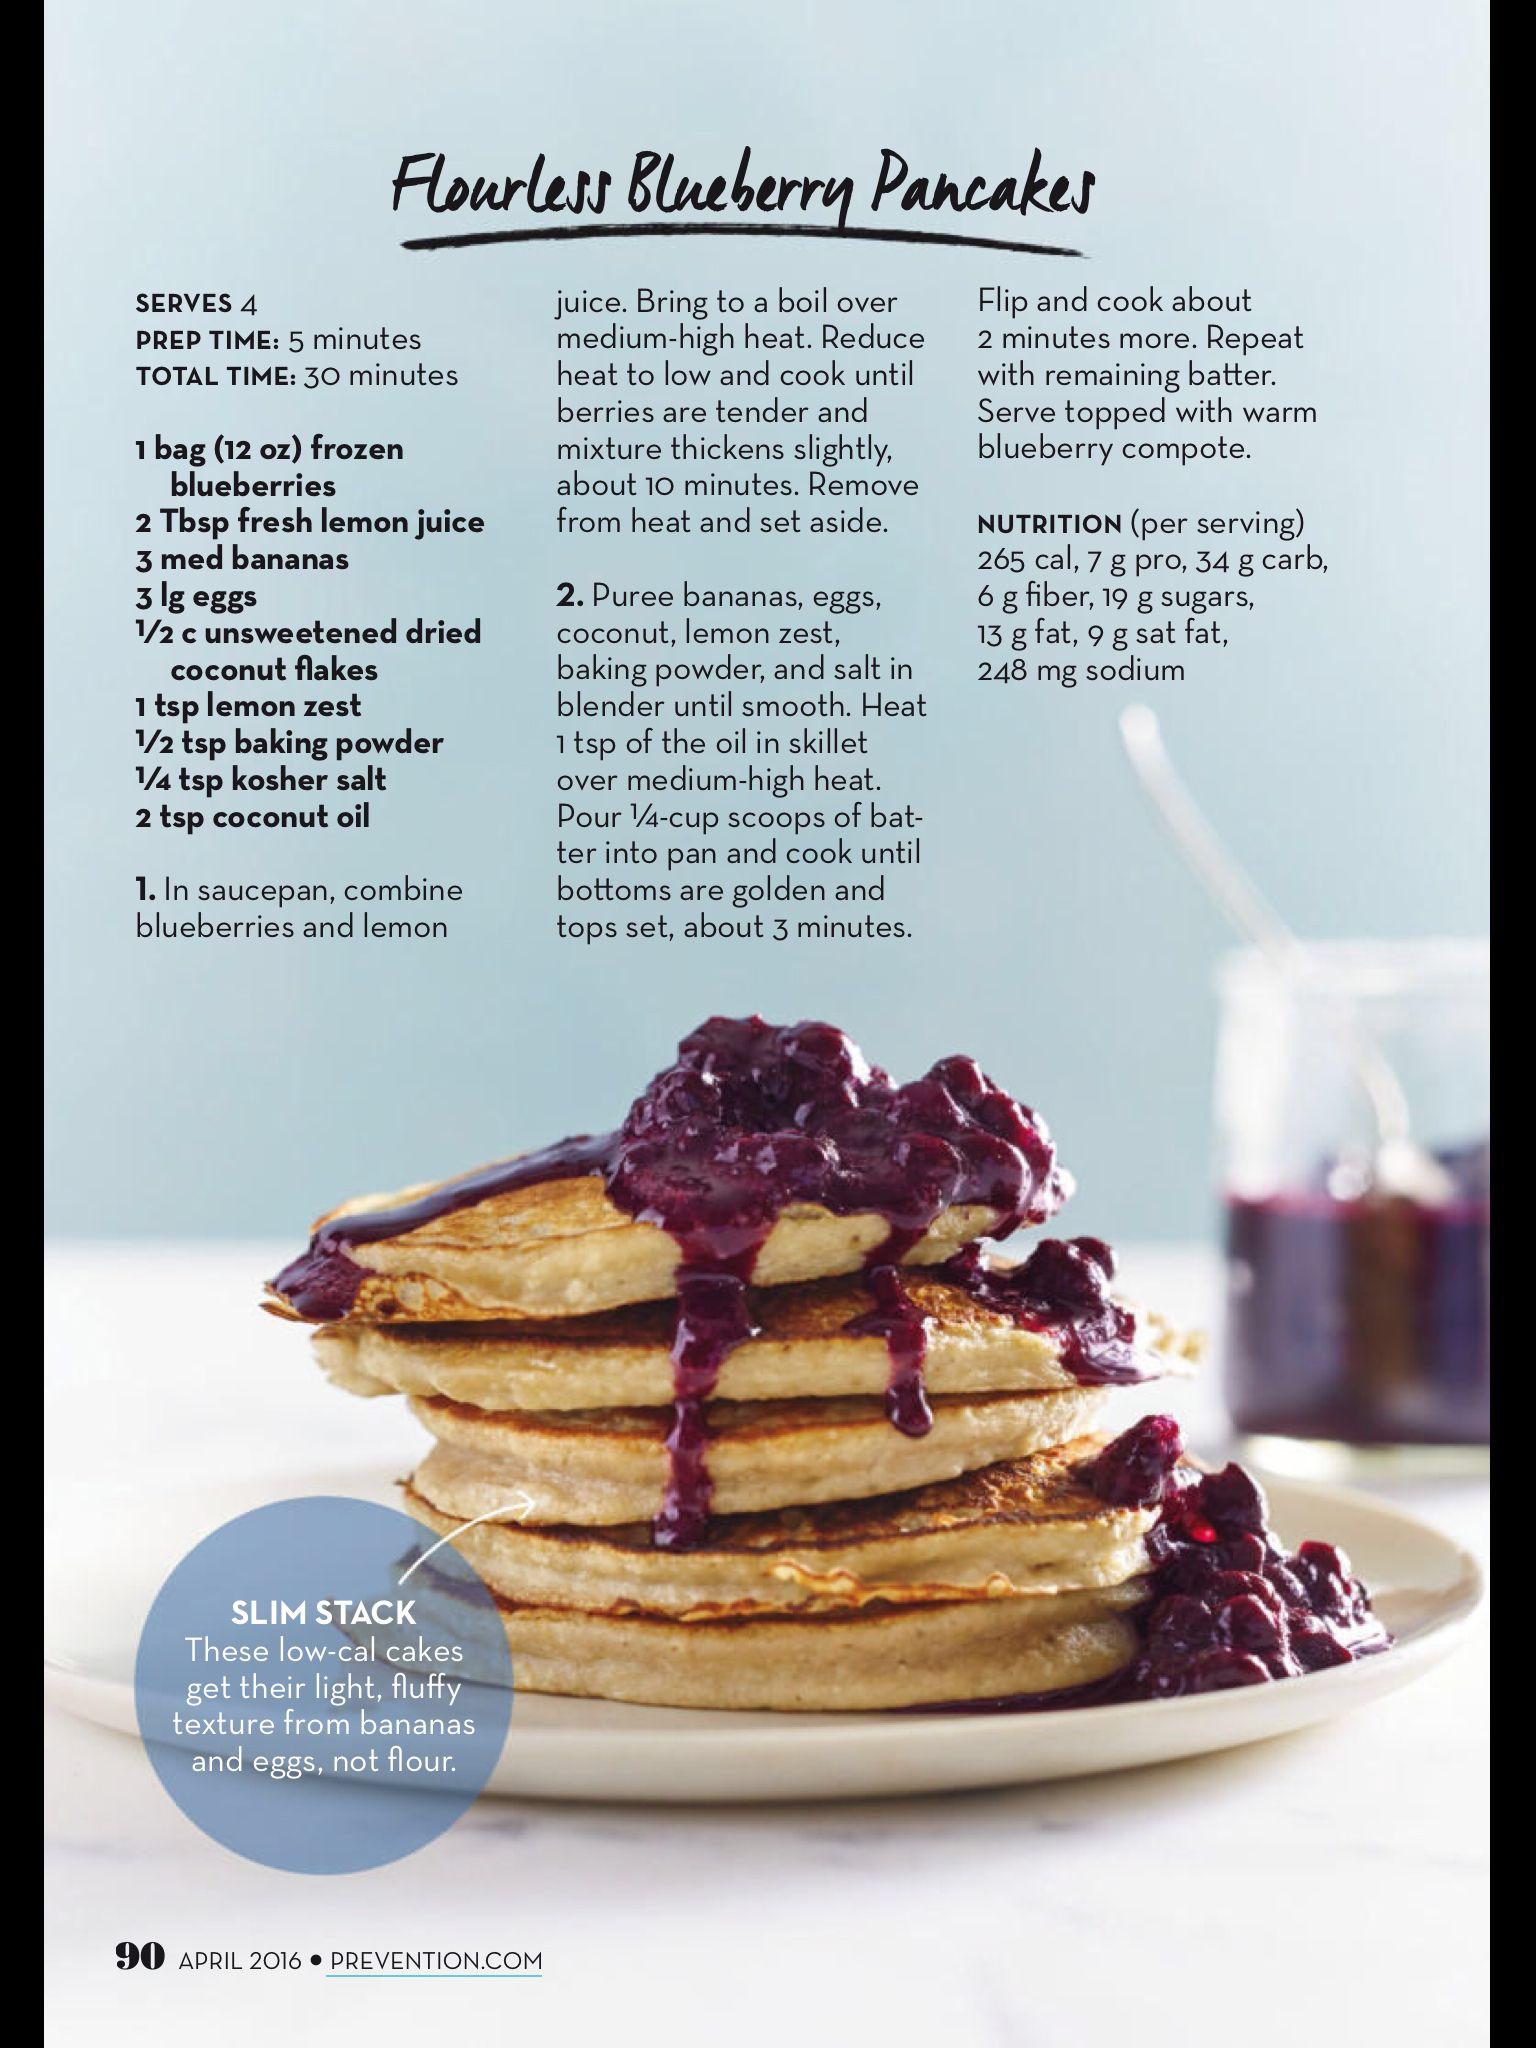 Blueberry pancakes flourless eat blueberry pancakes food